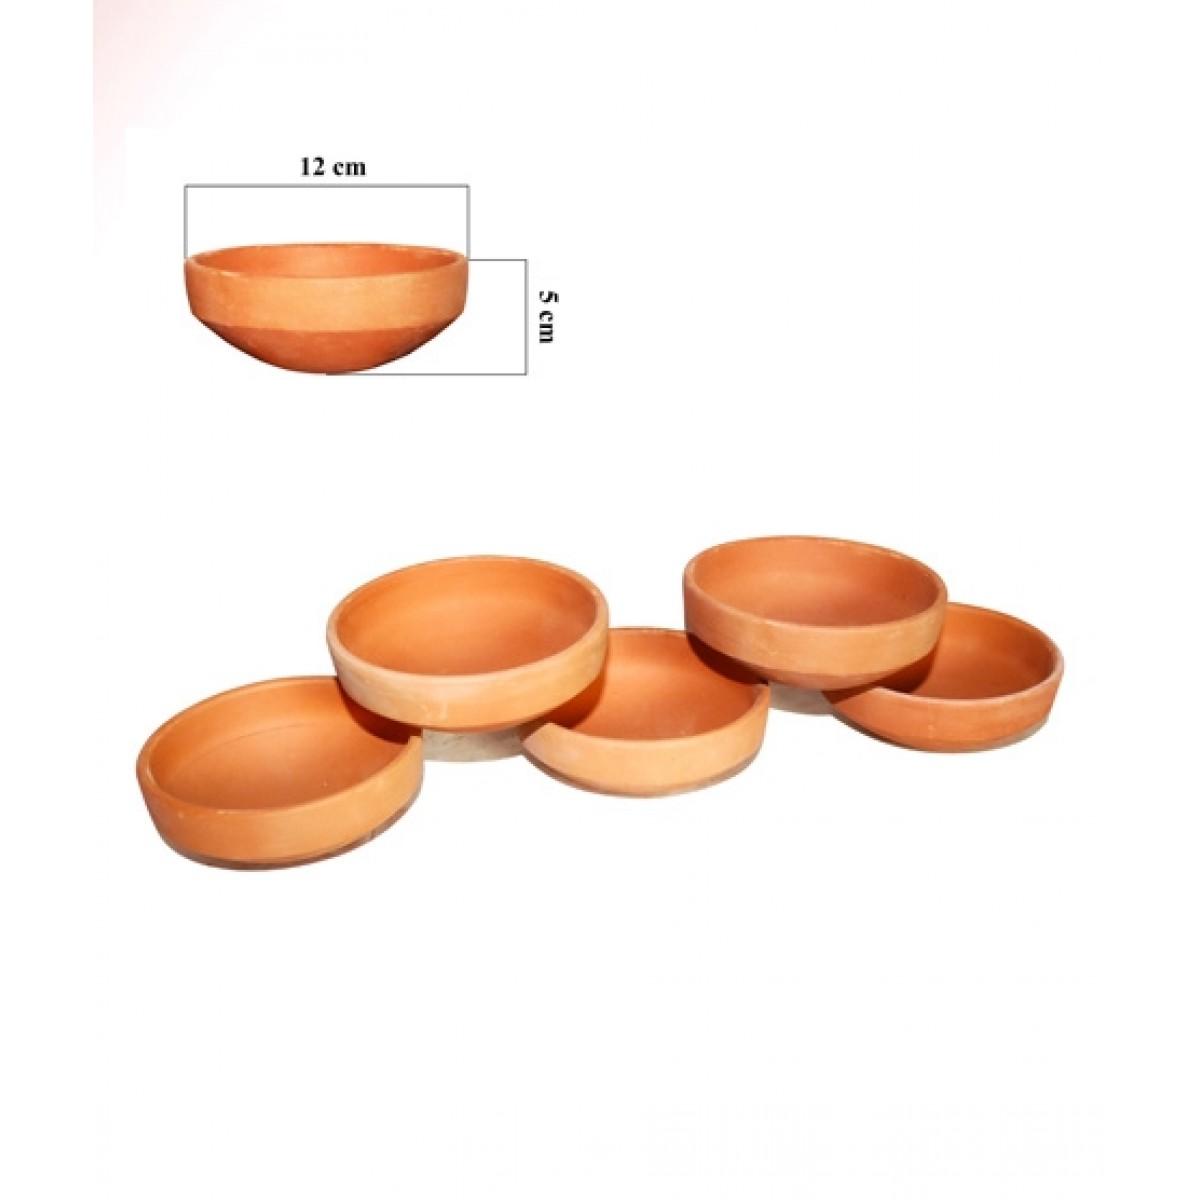 Clay Potter Clay Bowls Set 5 Pcs